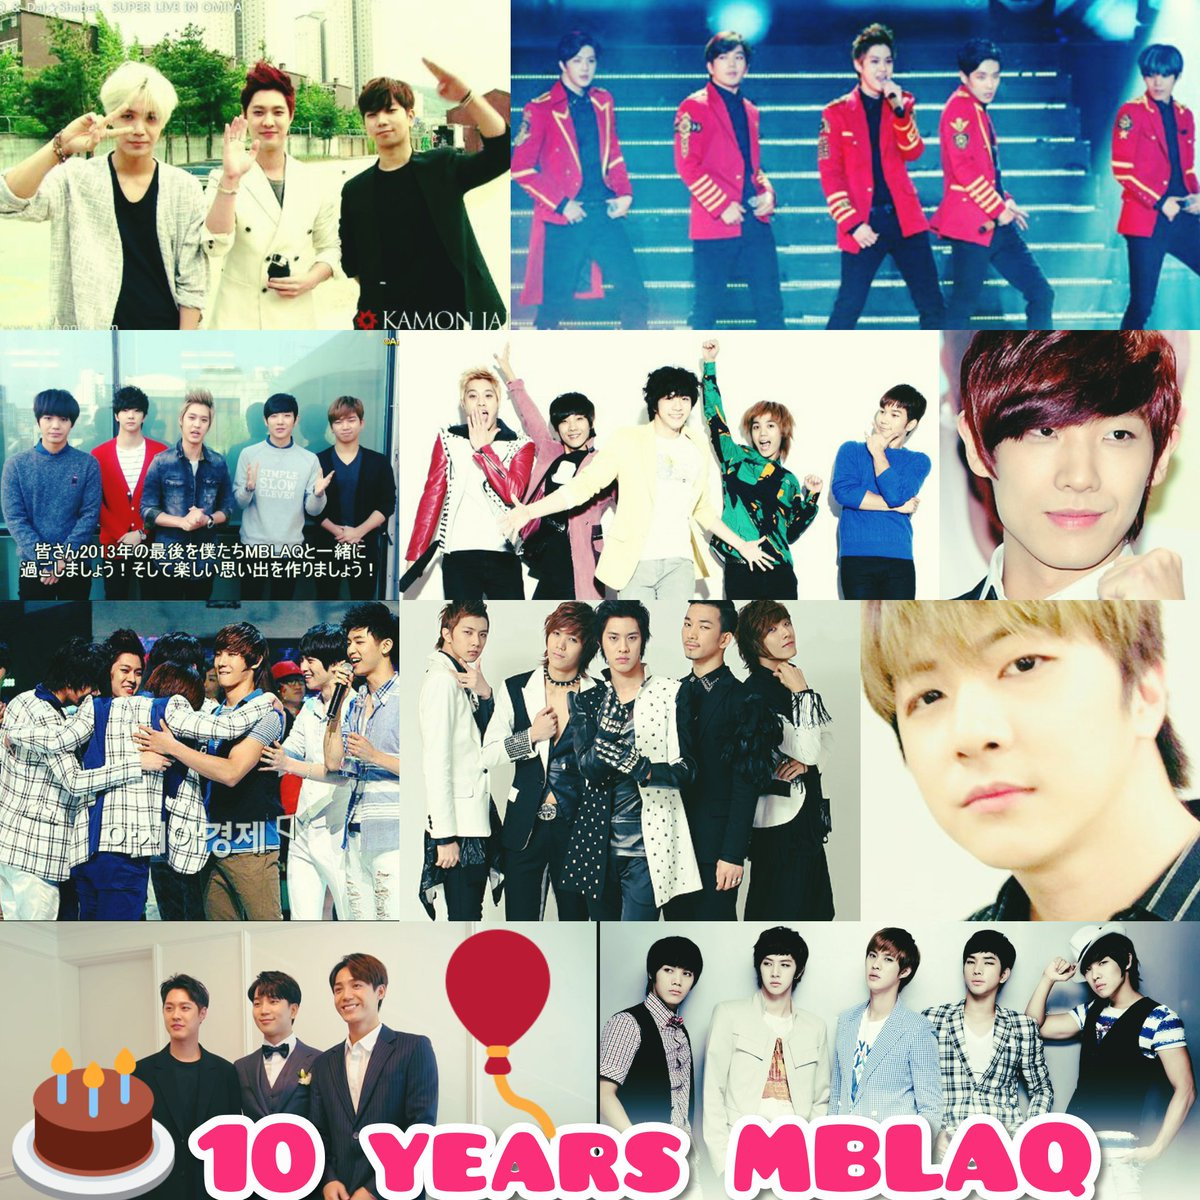 MBLAQ's 10th Anniversary <br>http://pic.twitter.com/4oQexp9EJY